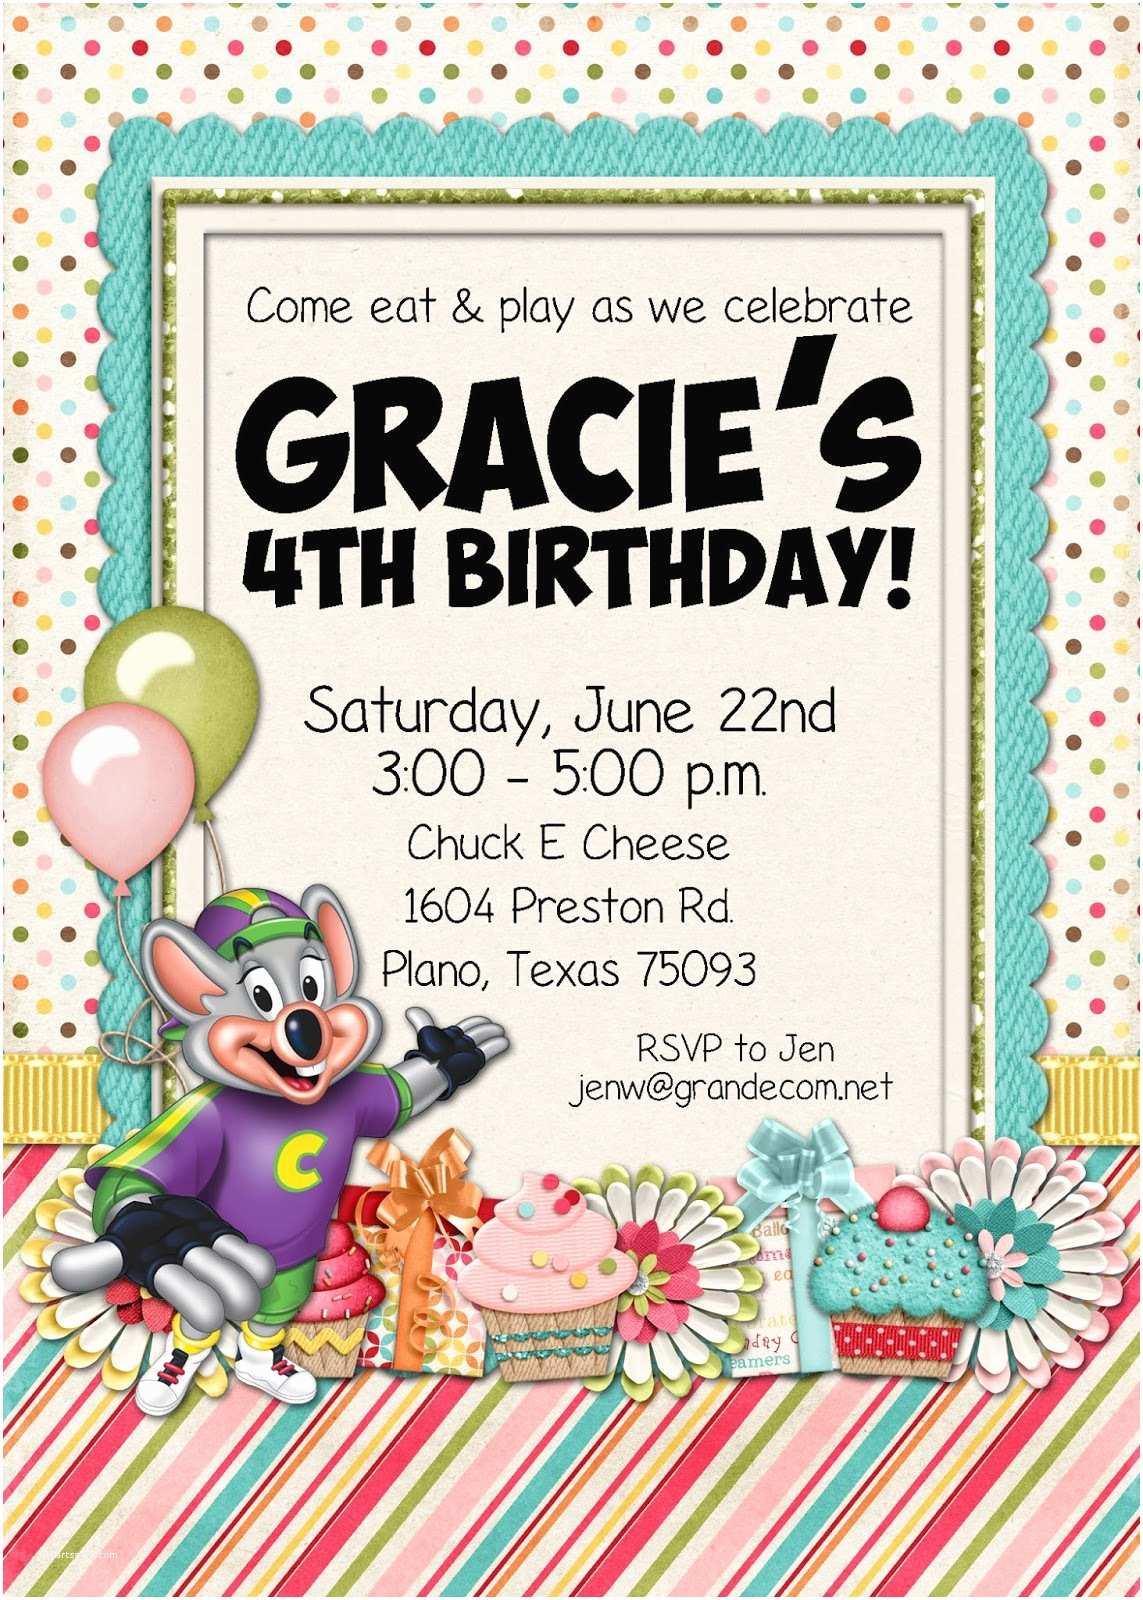 Chuck E Cheese Birthday Invitations Slightly askew Designs Chuck E Cheese Party